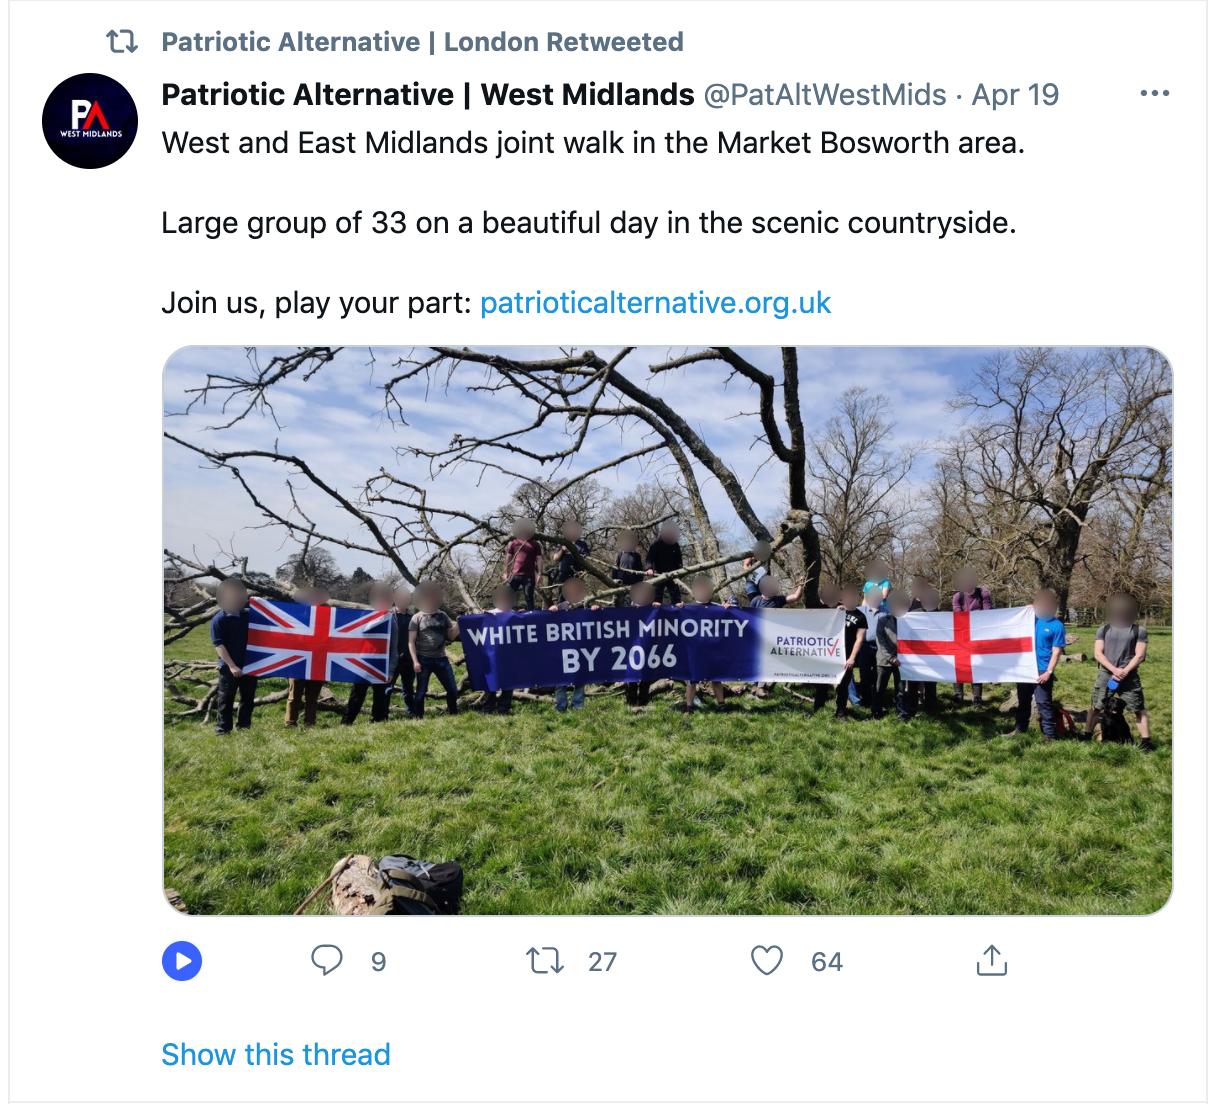 patriotic alternative tweet